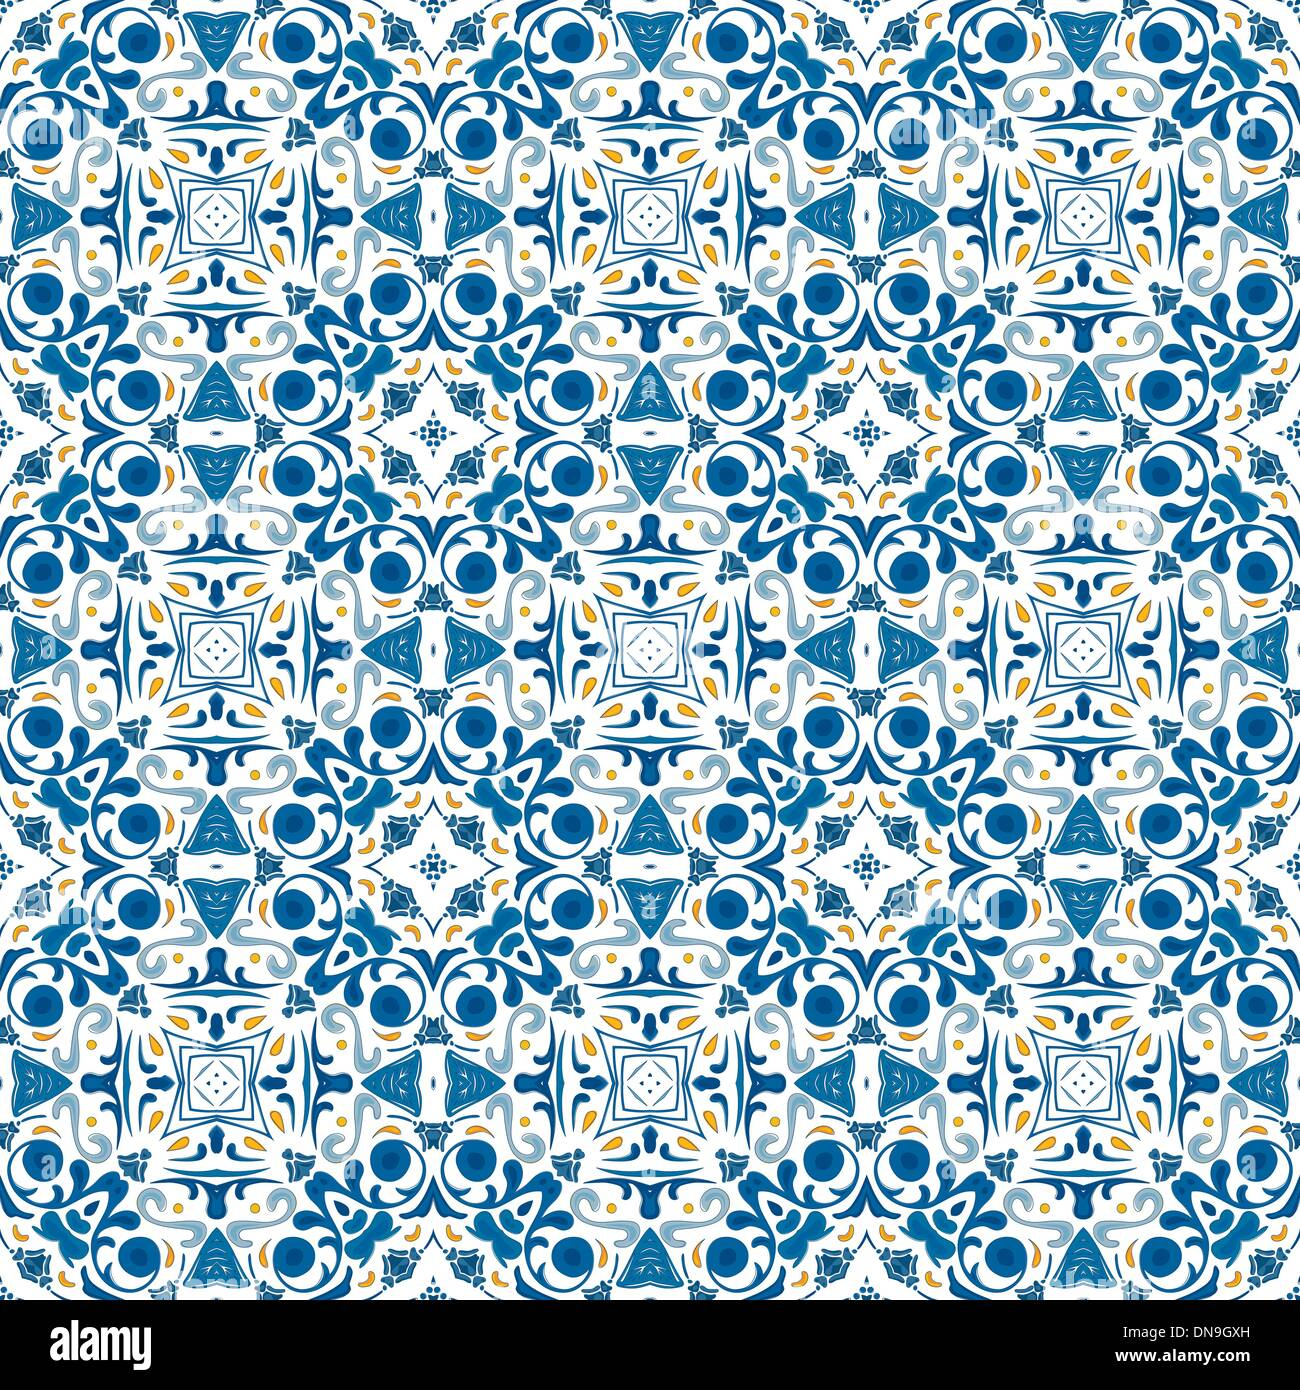 Portuguese tiles - Stock Image